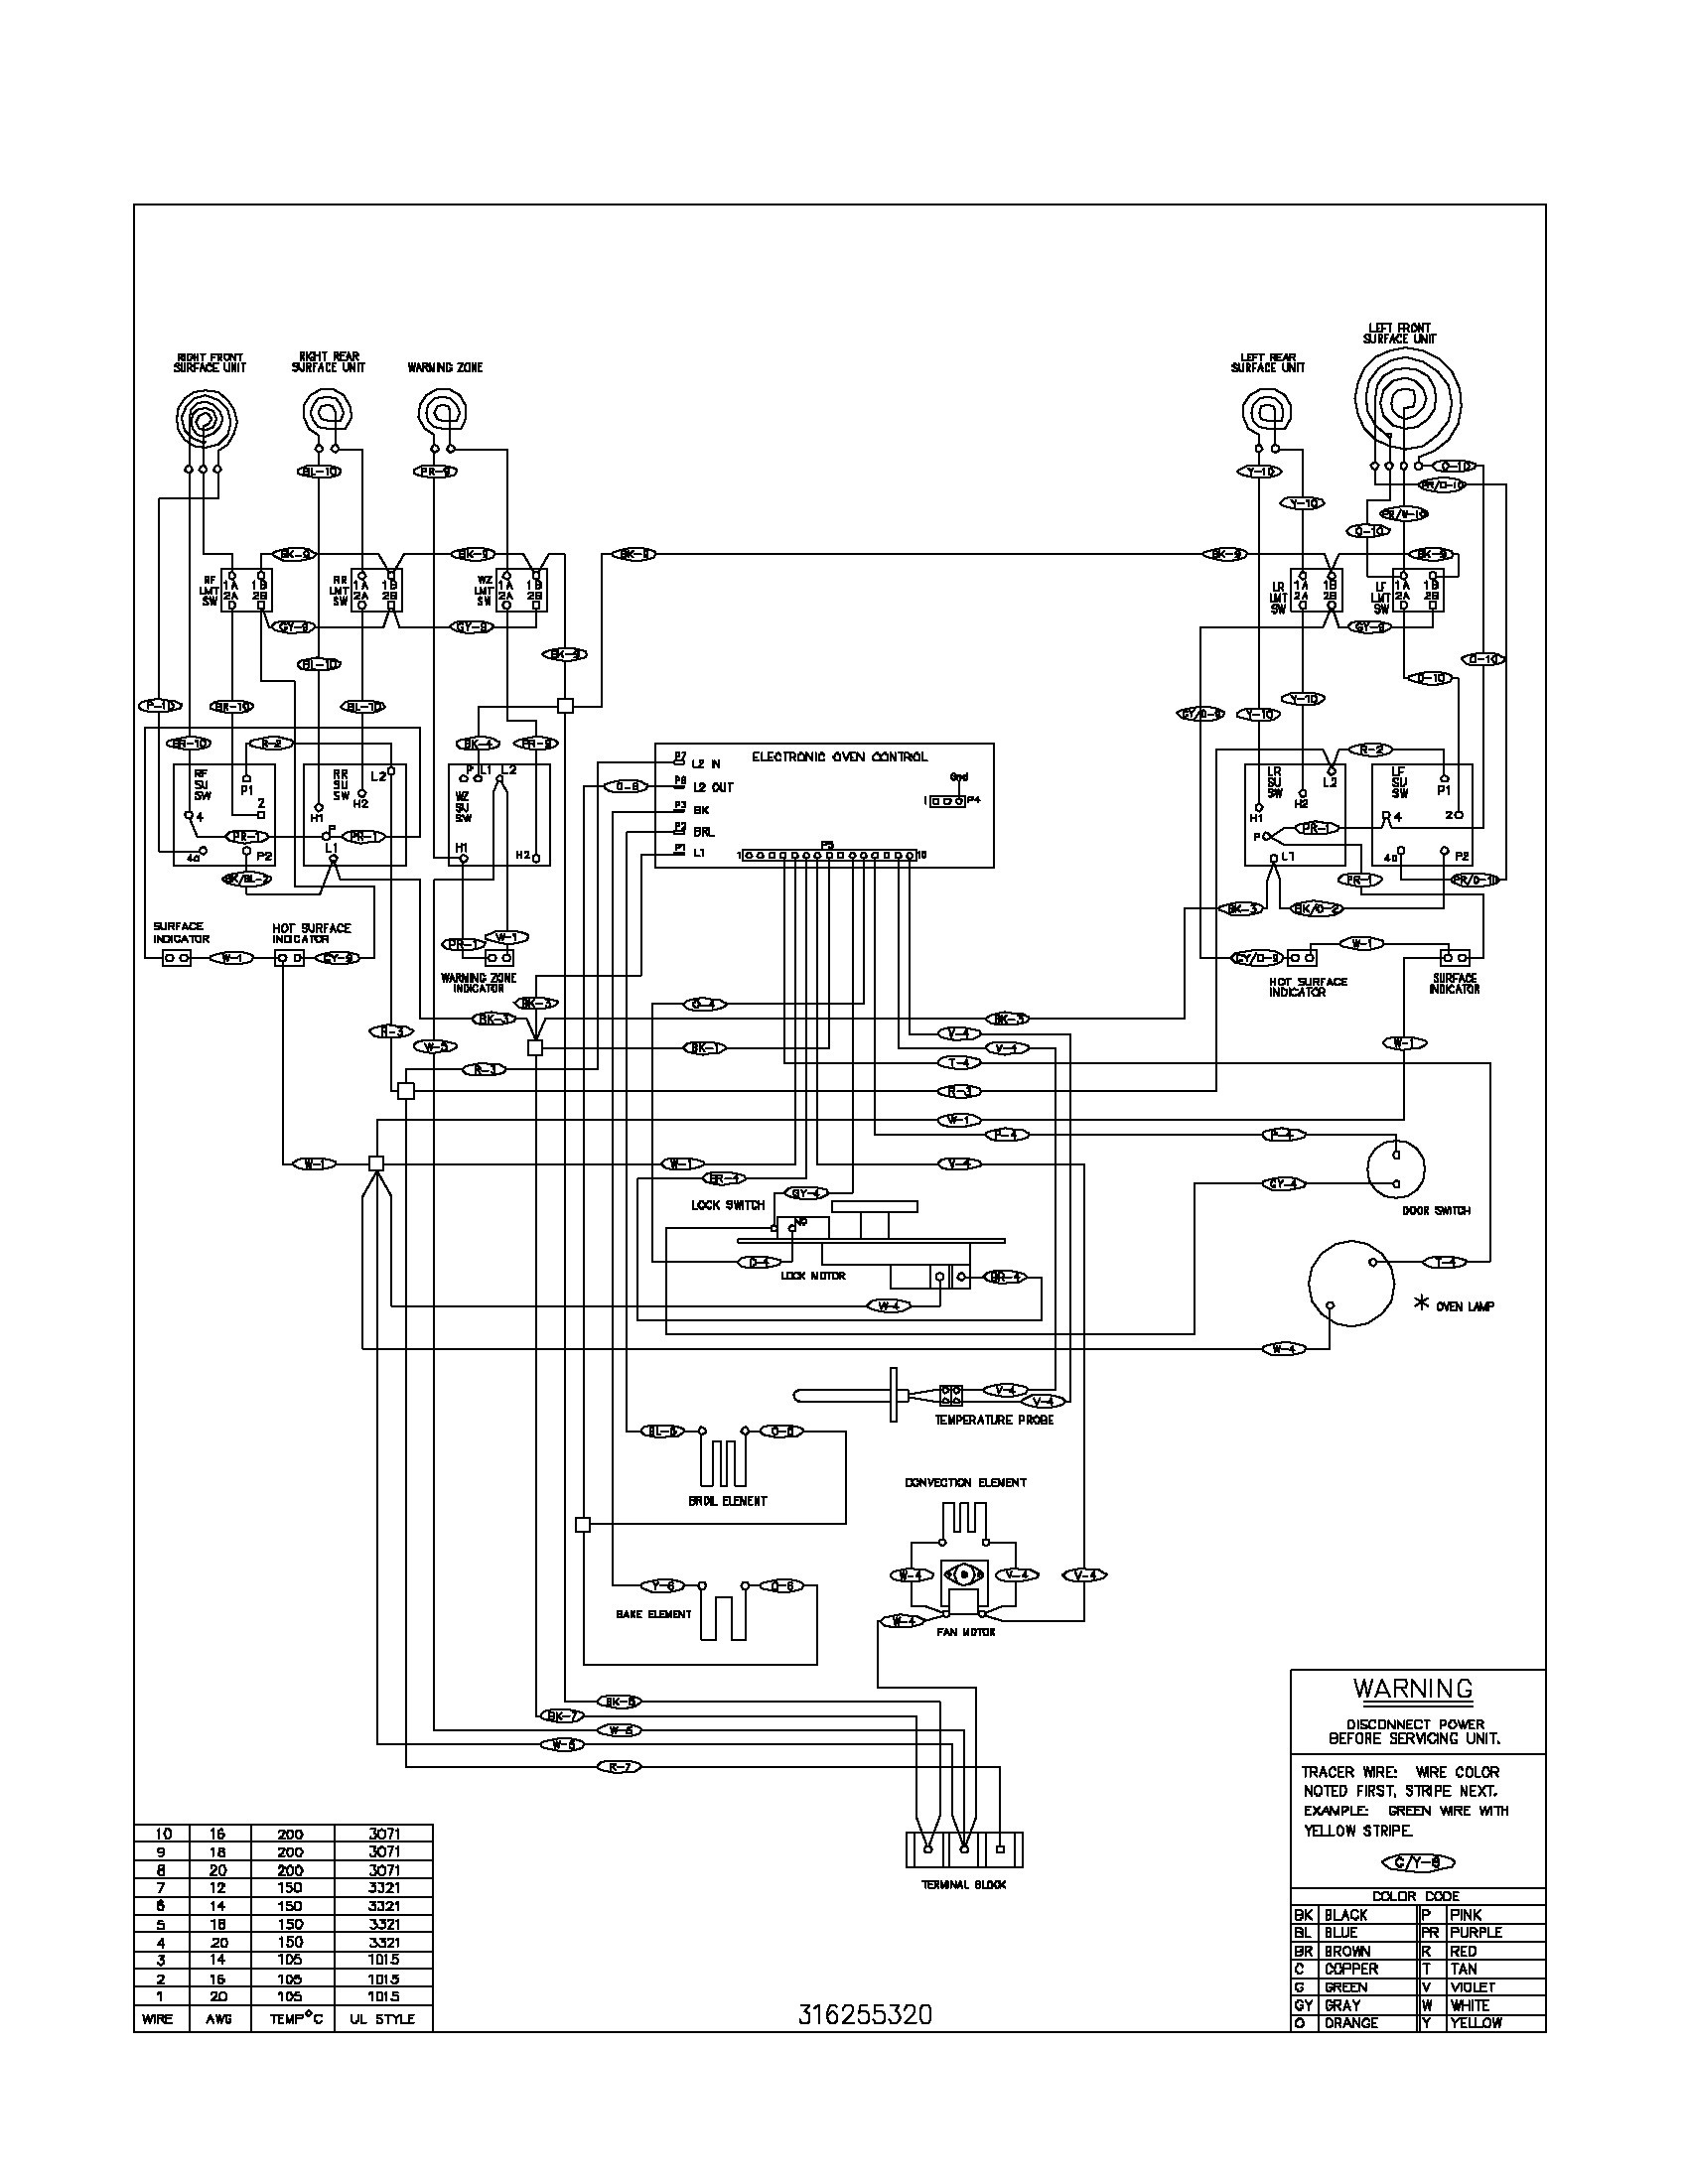 Whirlpool Dryer Schematic Wiring Diagram: Whirlpool Wire Diagram - Wiring Diagram Worldrh:5.adzc.valerie-suty.de,Design